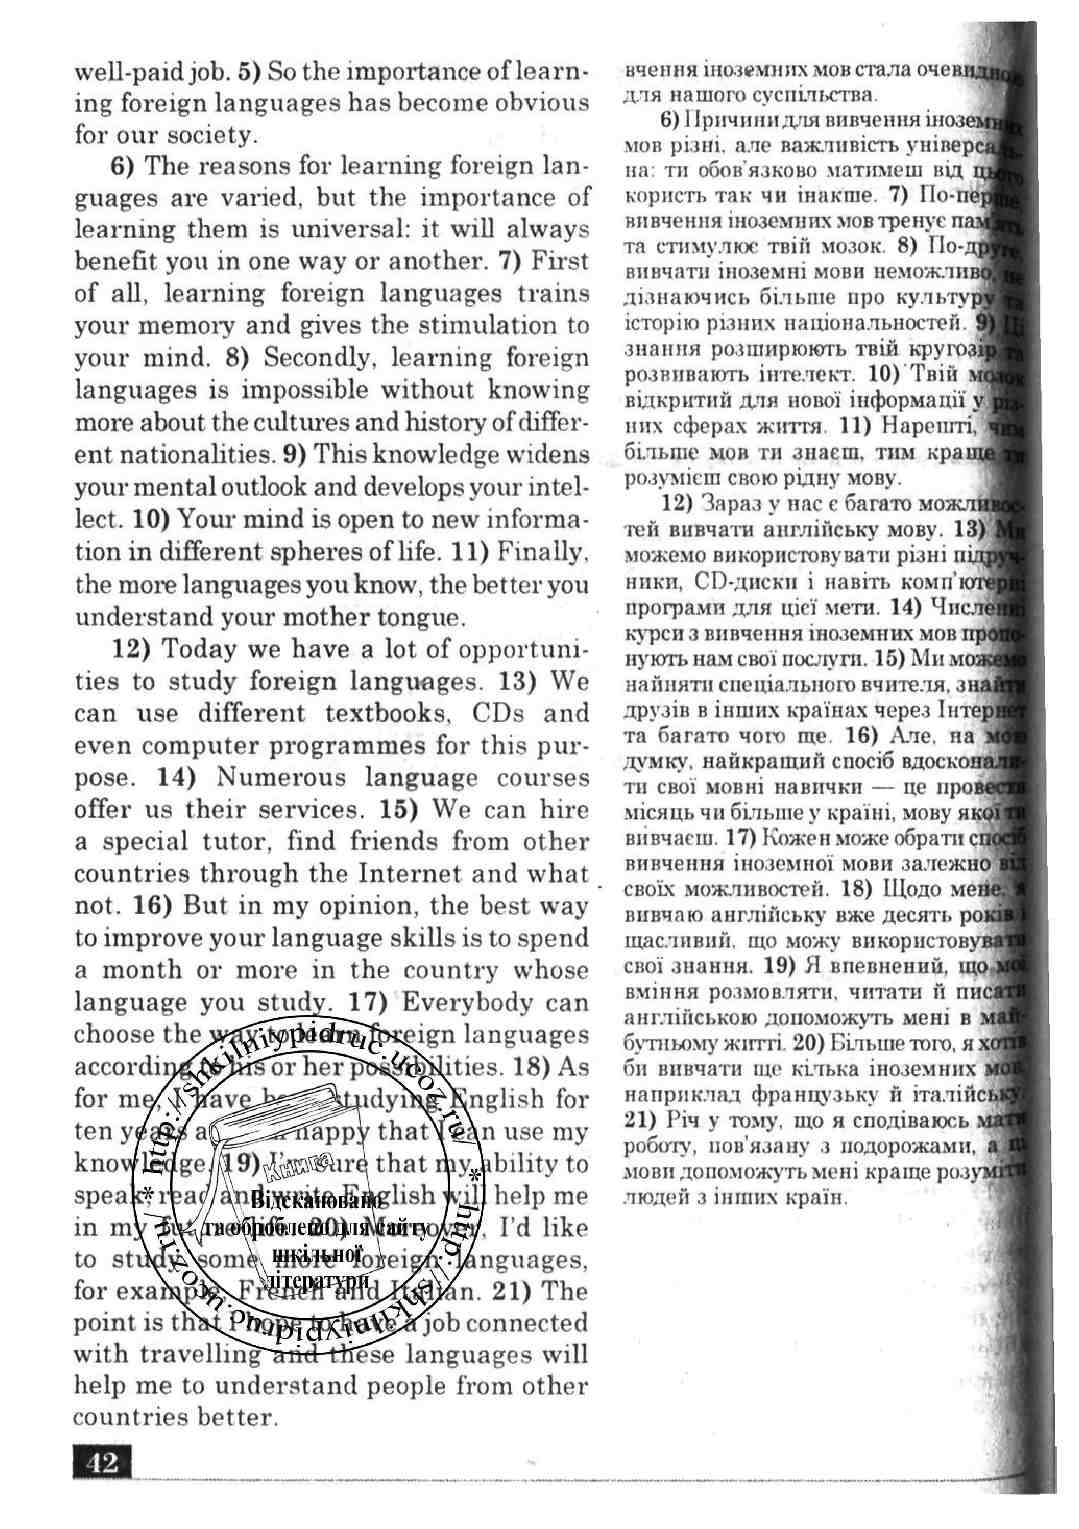 Химиков chemistry английский серебренникова text язык решебник для